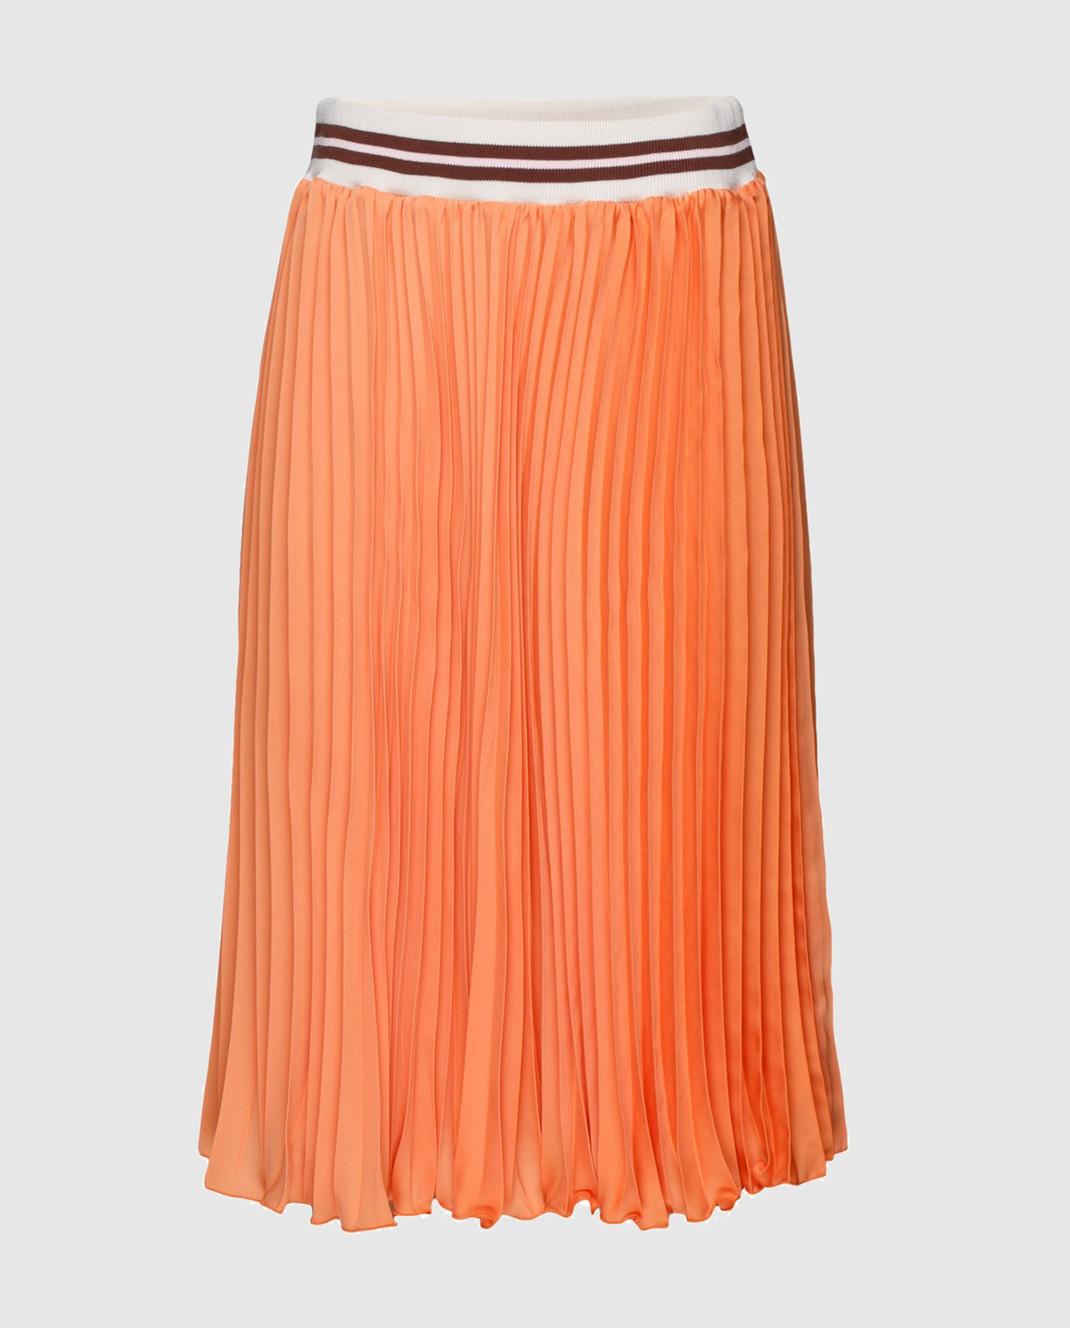 Blugirl Оранжевая юбка-плиссе 3321